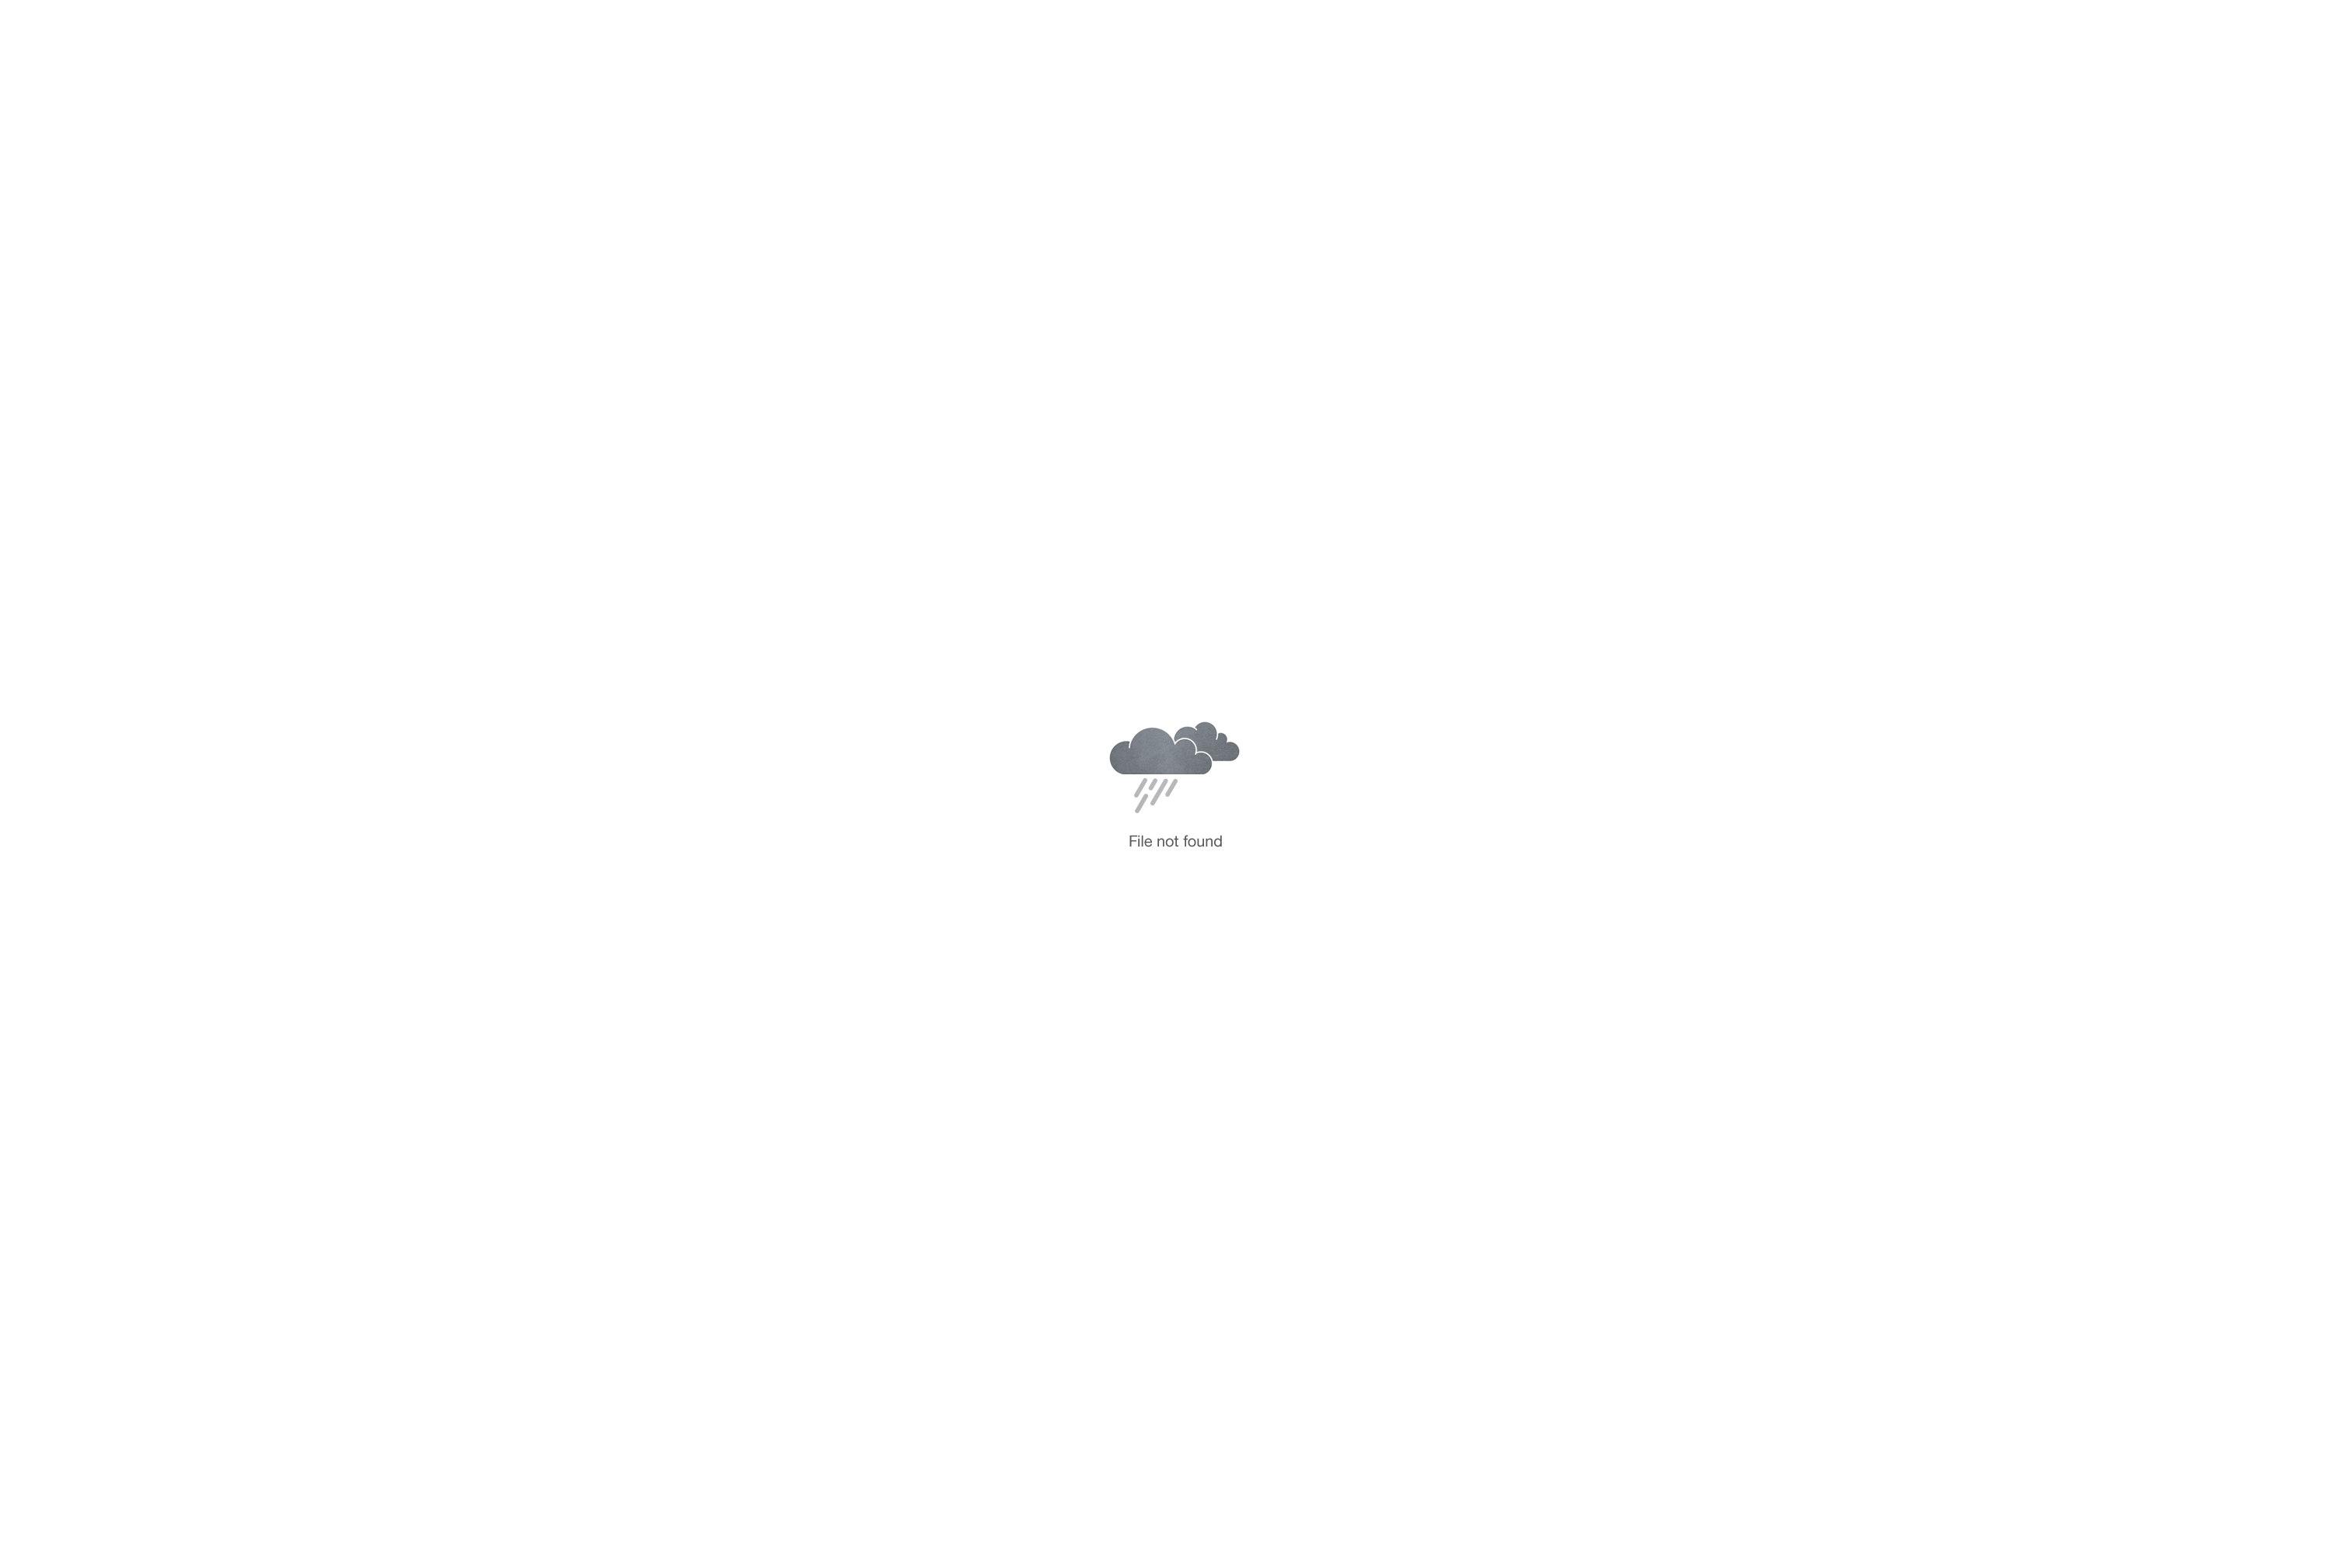 FFSU-Toulouse-Basket-Ball-Sponsorise-me-image-3